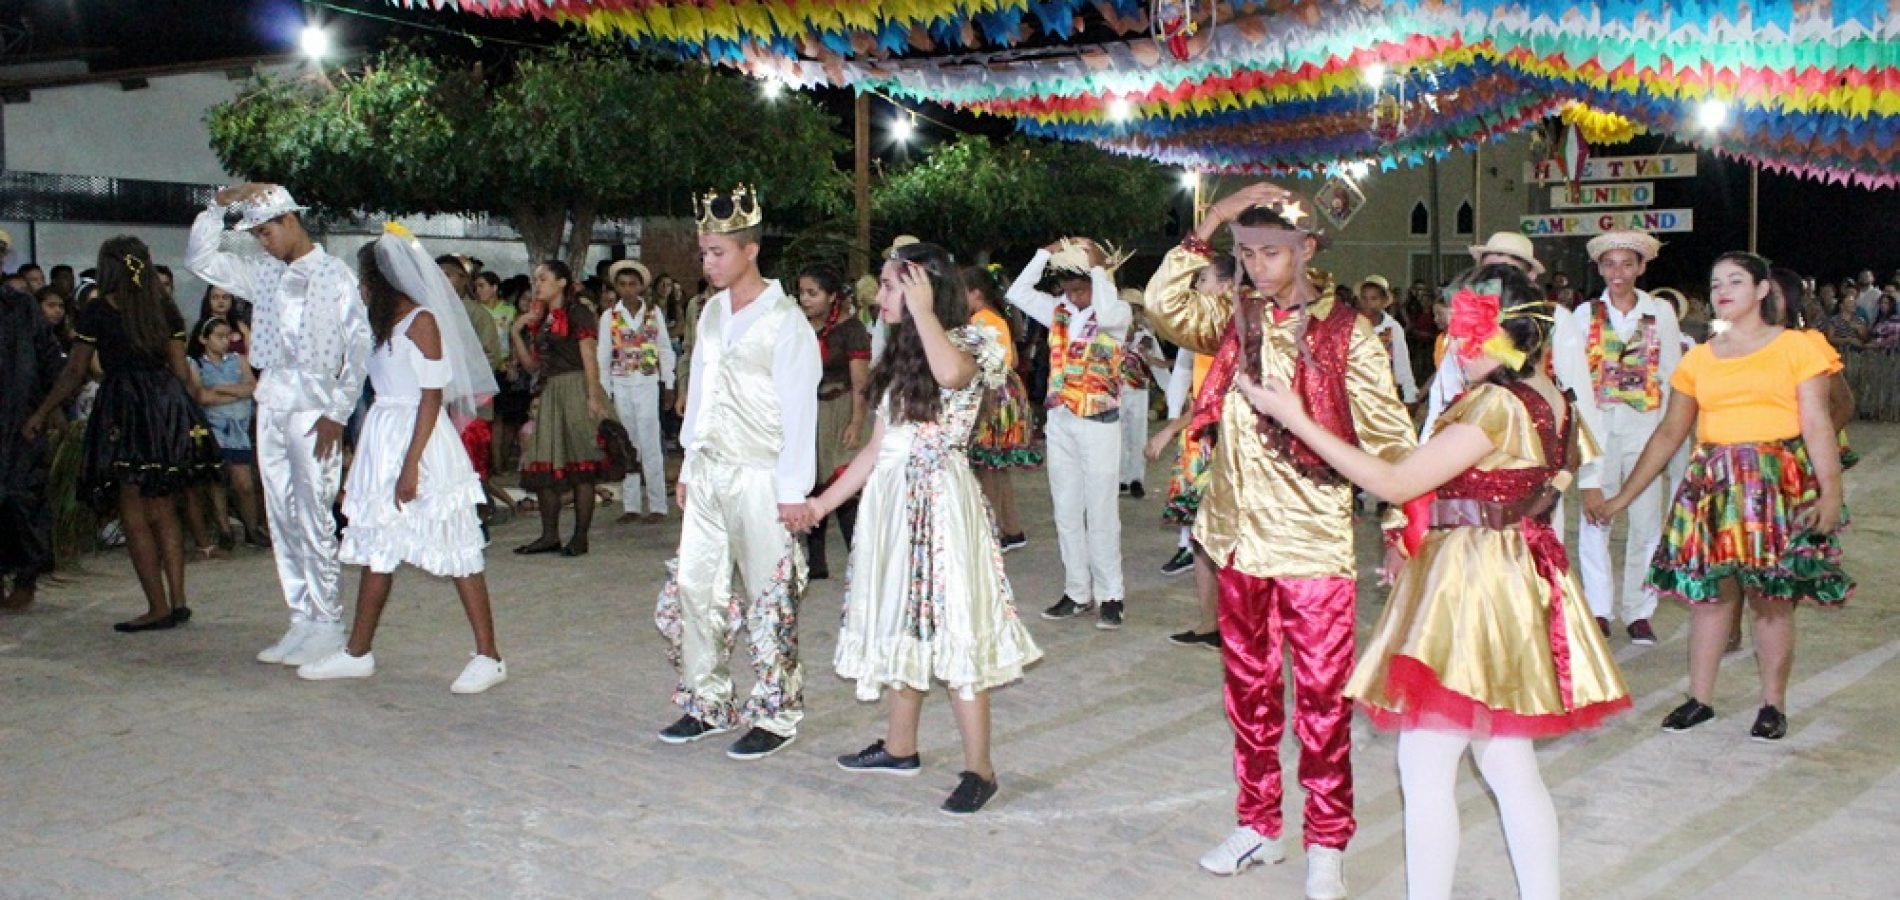 Confira fotos do II Festival Junino de Campo Grande do Piauí